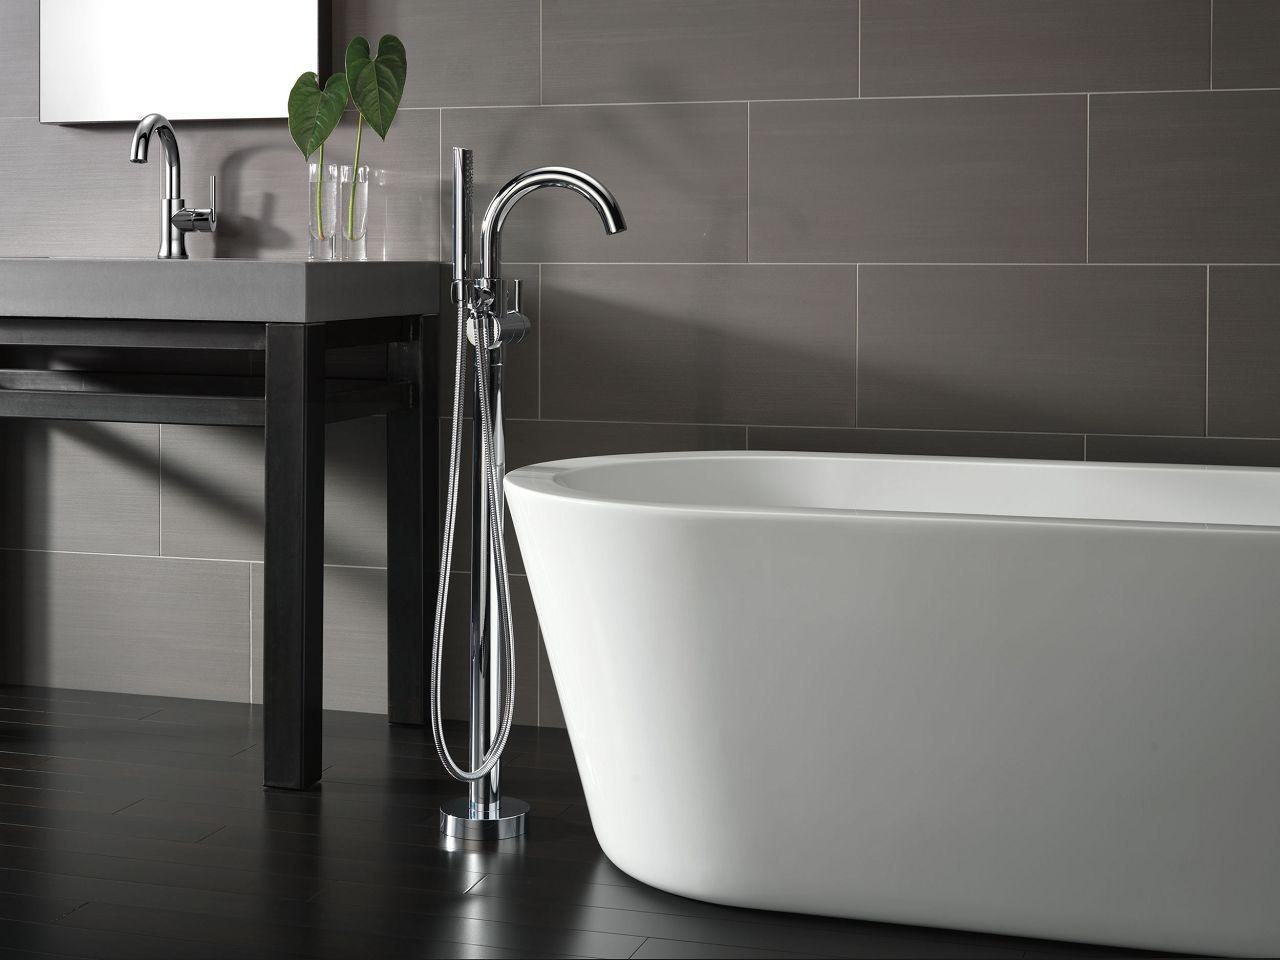 TRG photographed bathtub.jpg